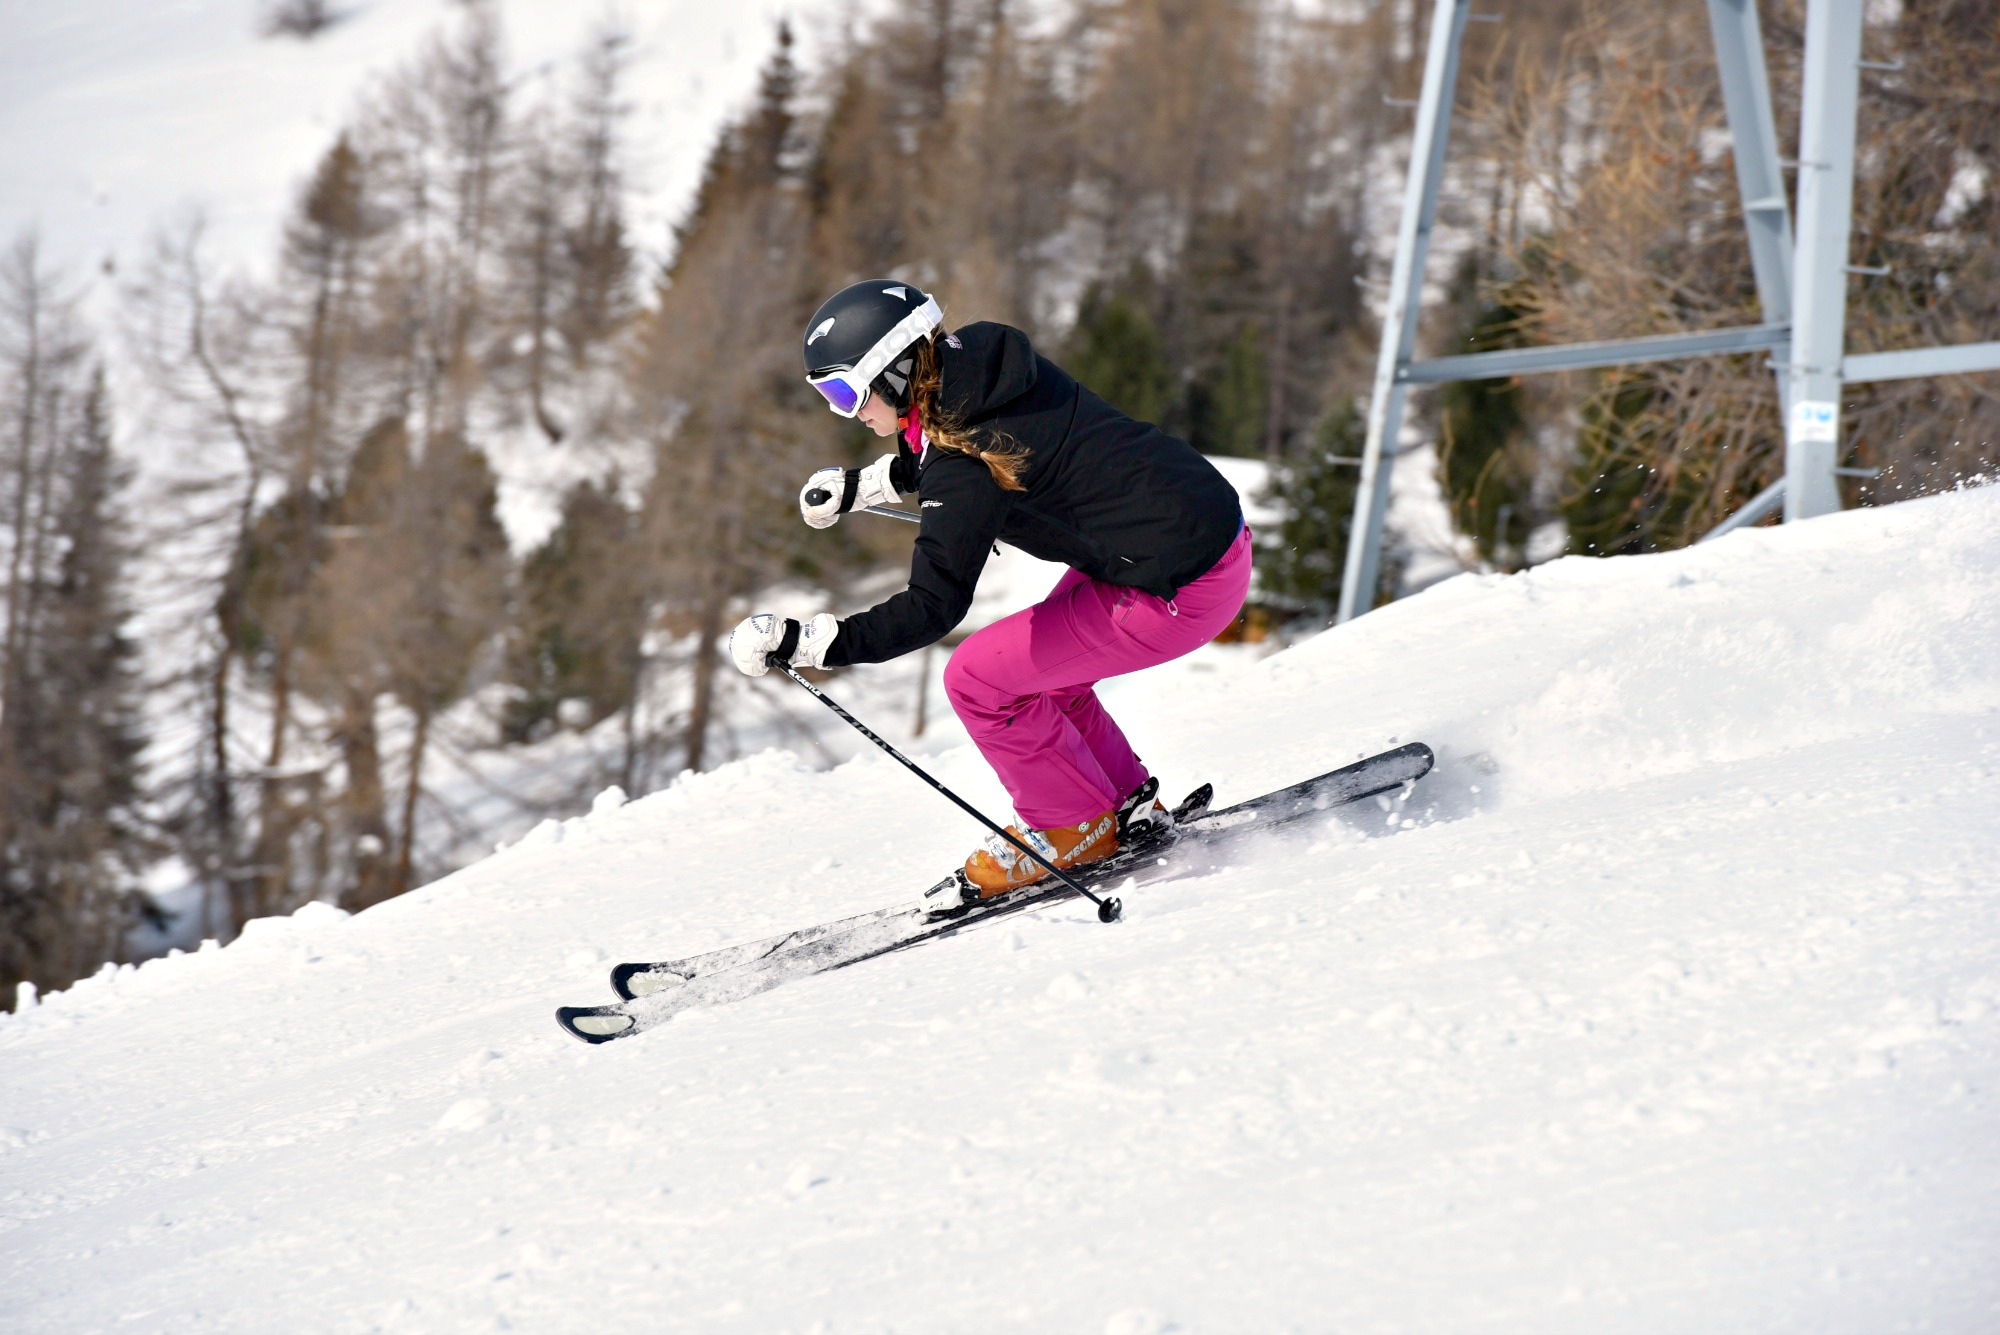 Fitnessblog-Klara-Fuchs-Österreich-Deutschland-Kästle-Ski-Blogger-Fitness-Blog1